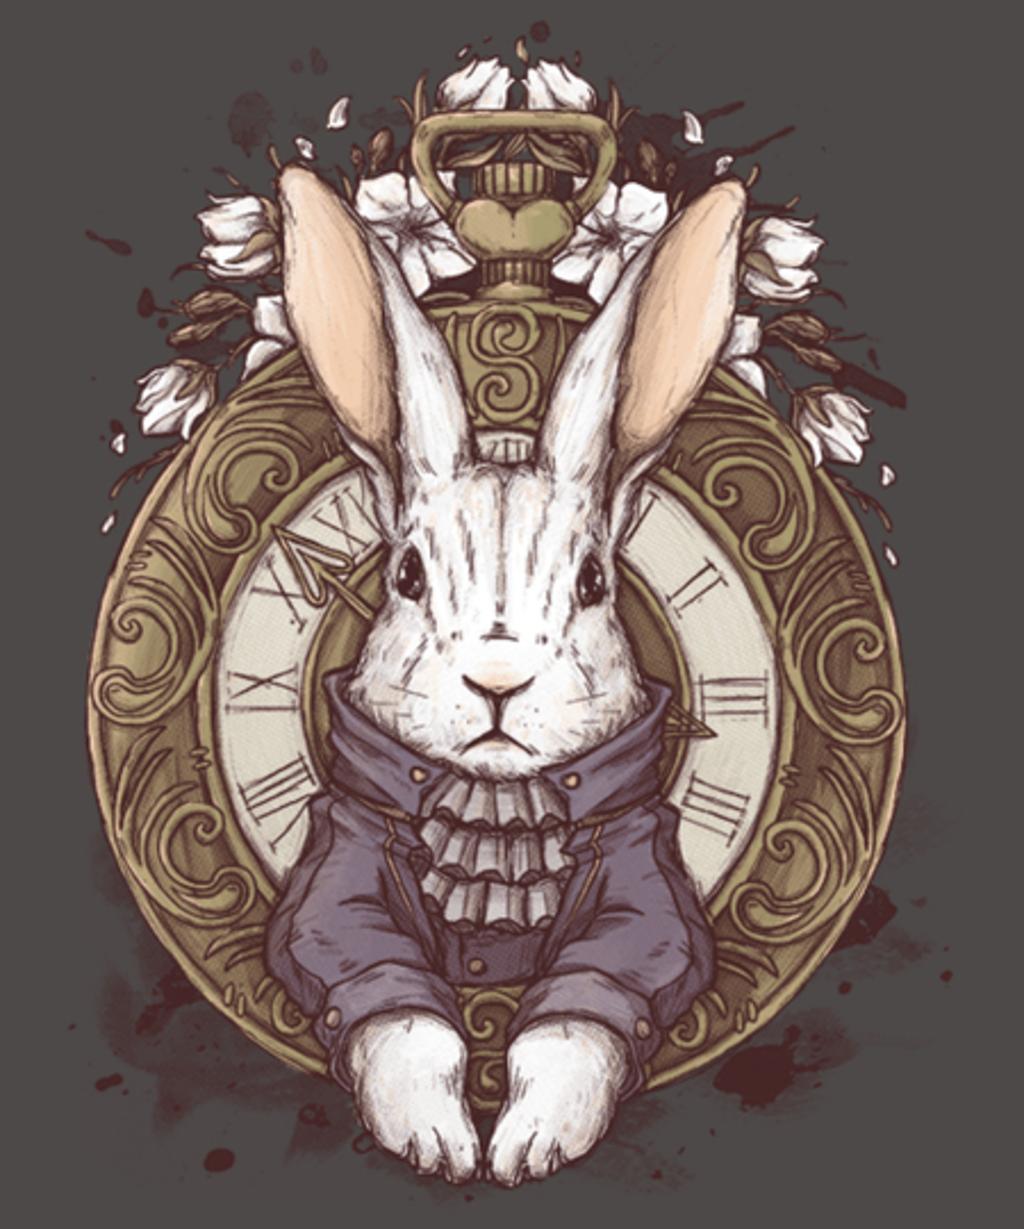 Qwertee: The White Rabbit